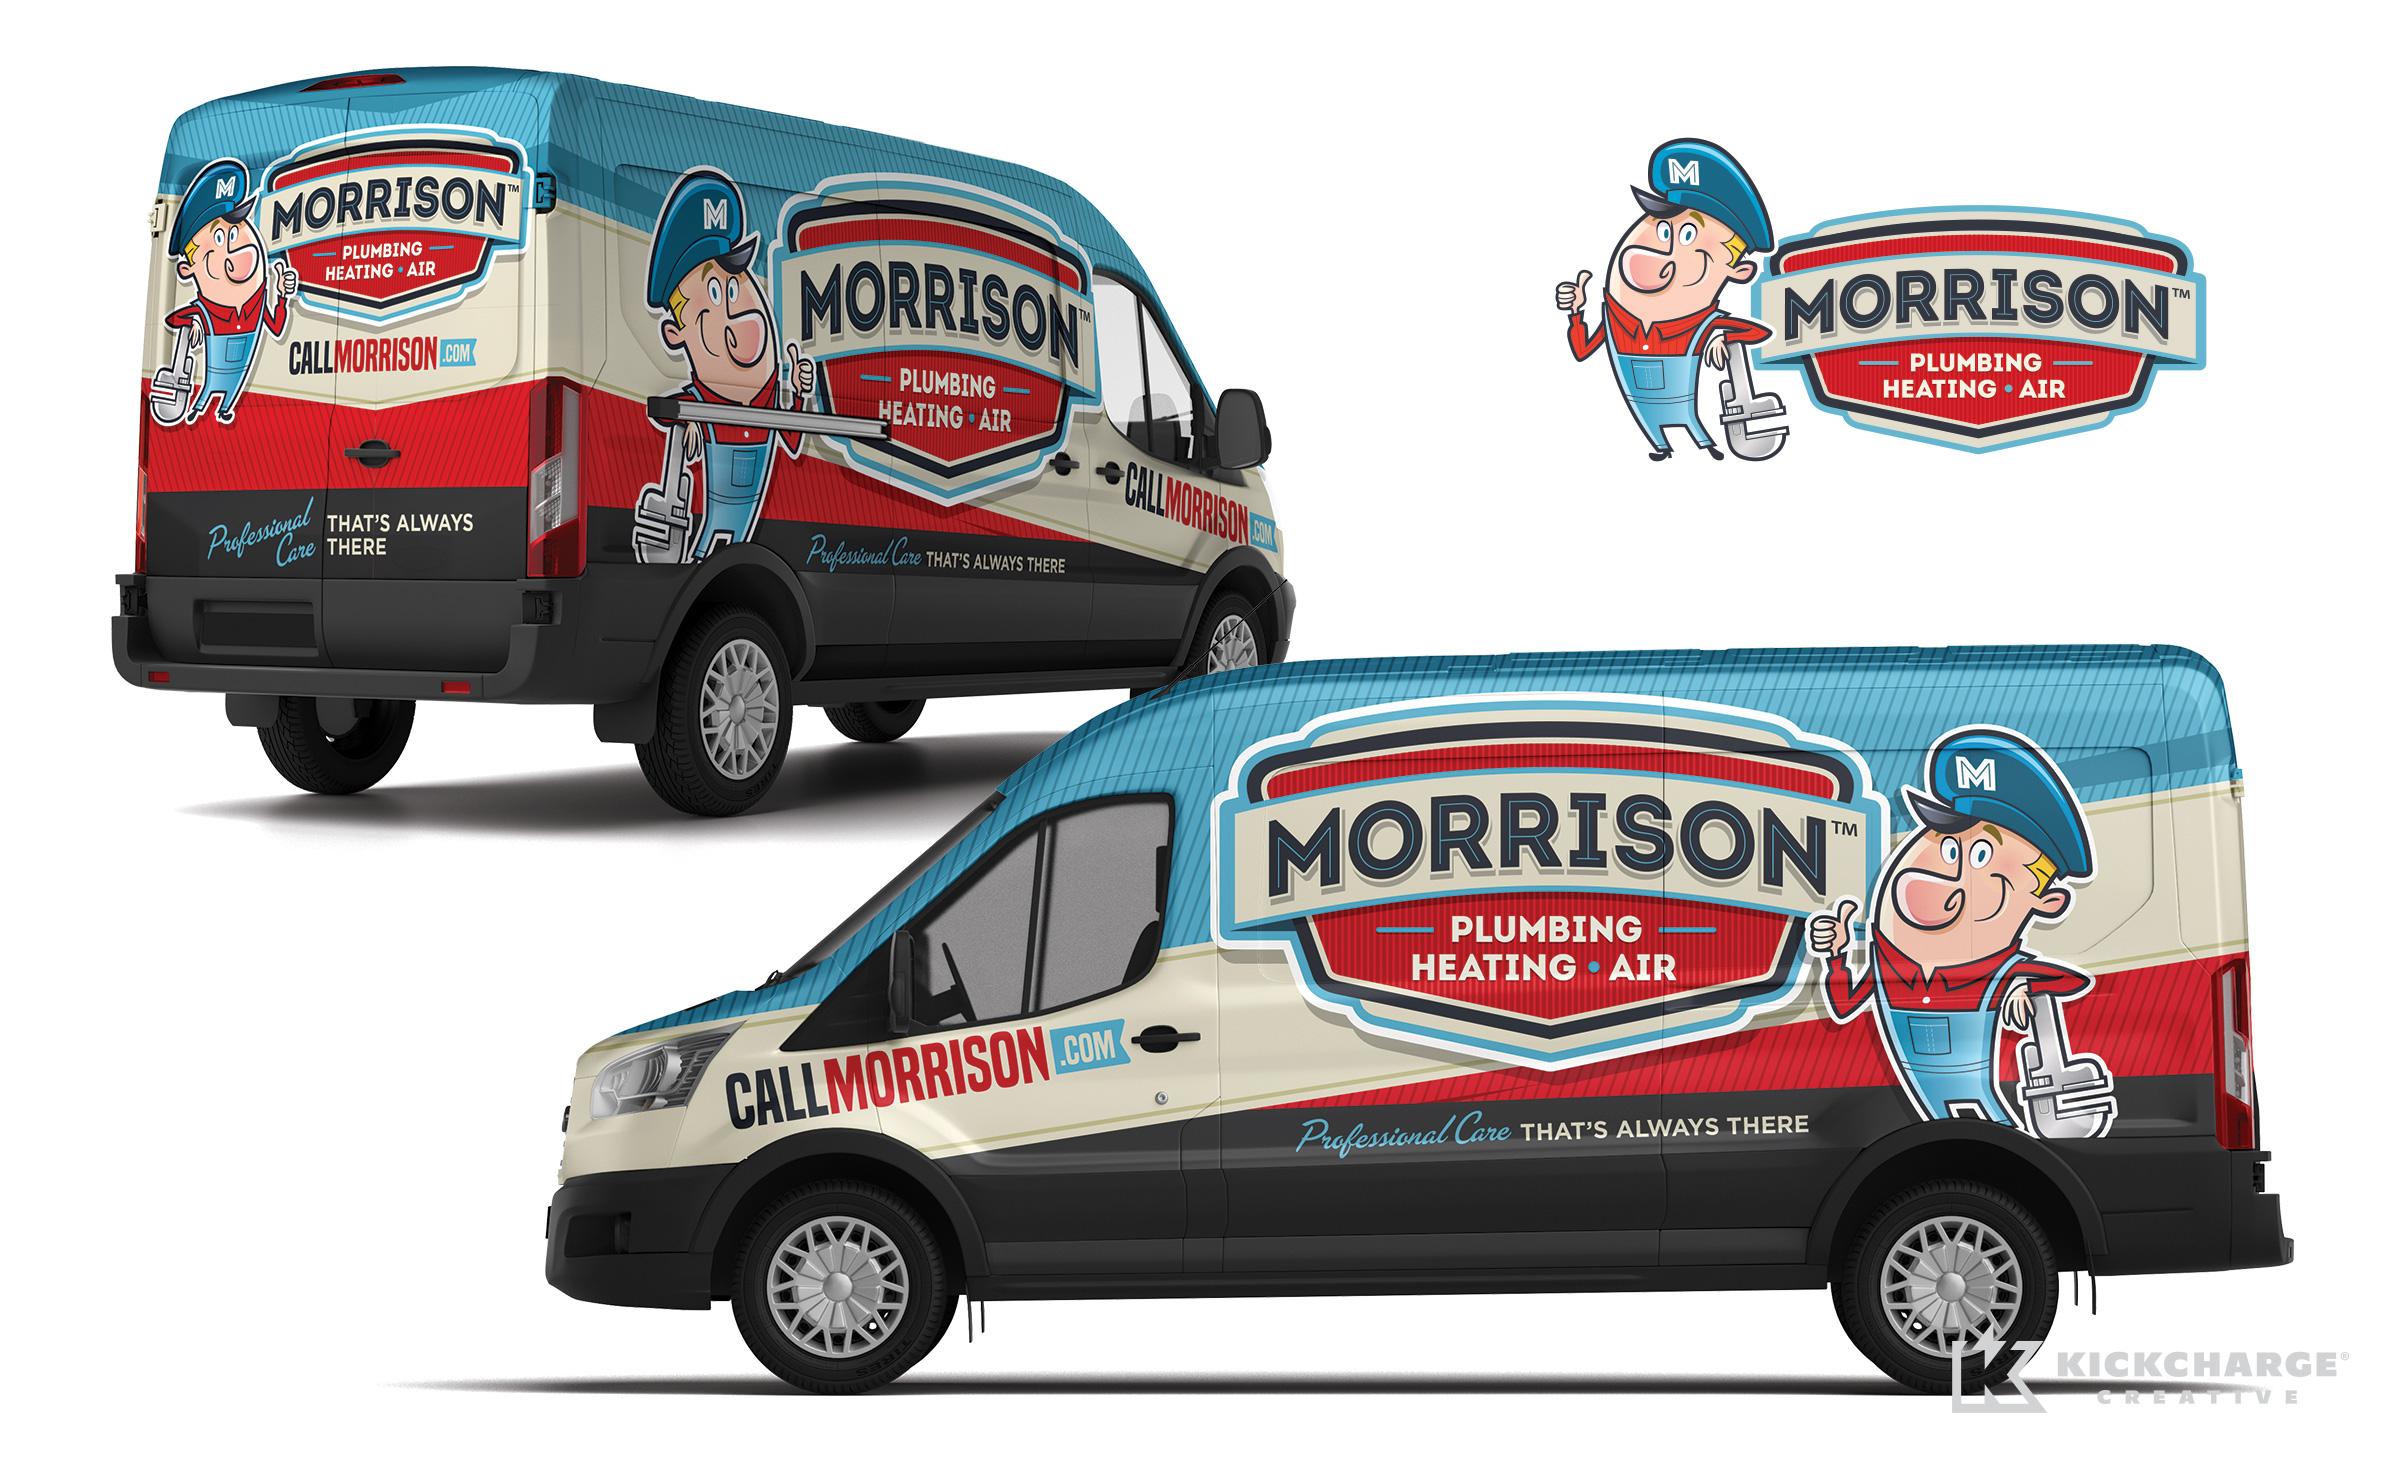 plumbing truck wrap for Morrison Plumbing, Heating & Air